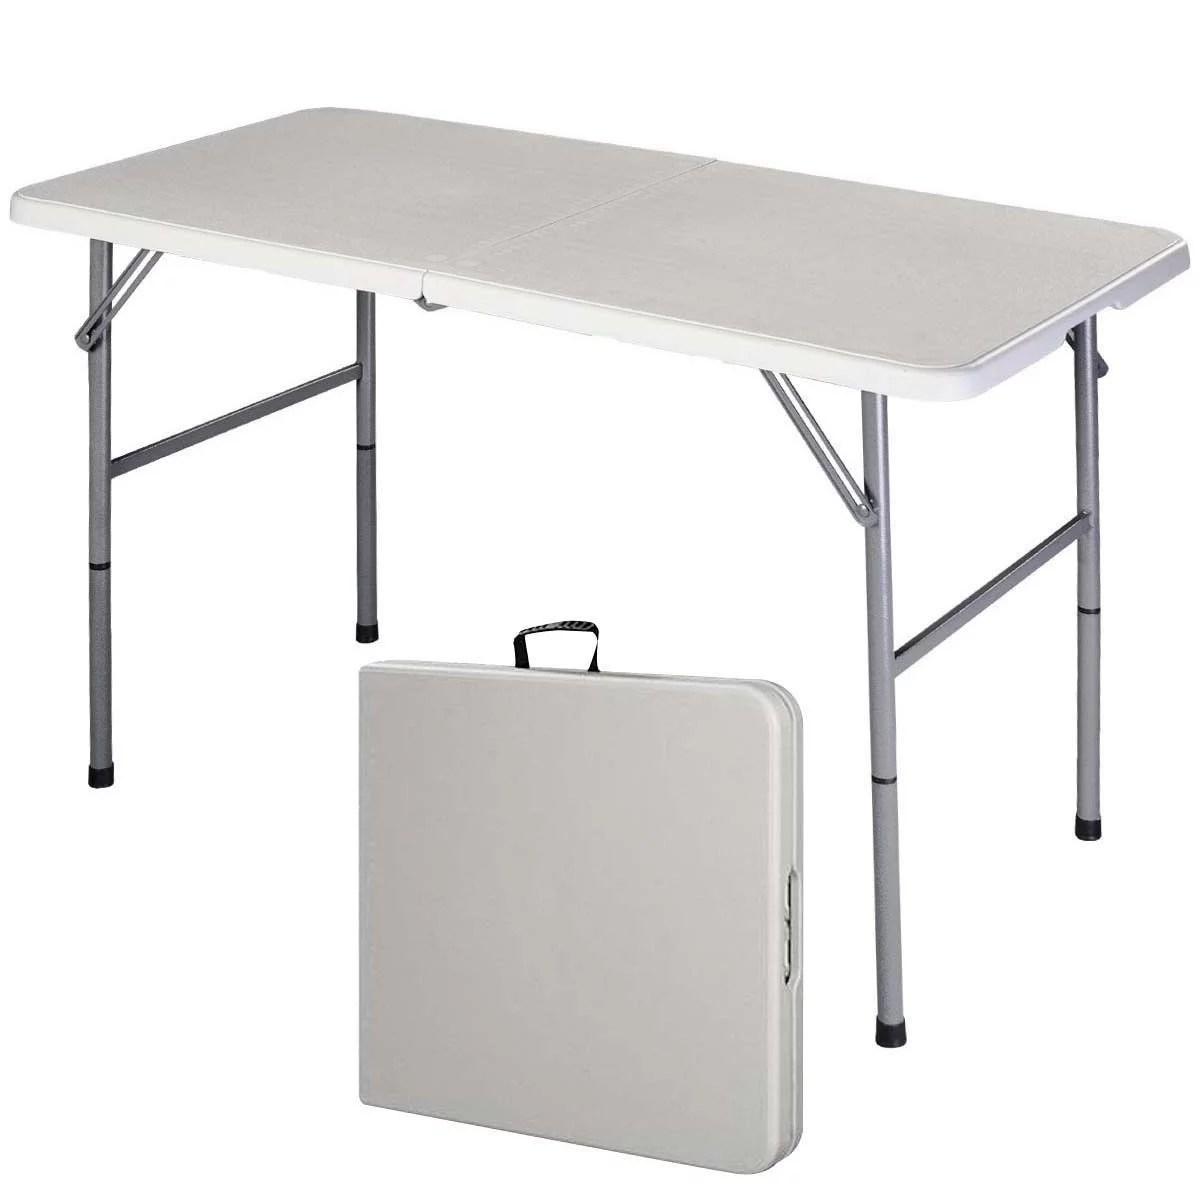 Costway 4 Folding Table Portable Indoor Outdoor Picnic